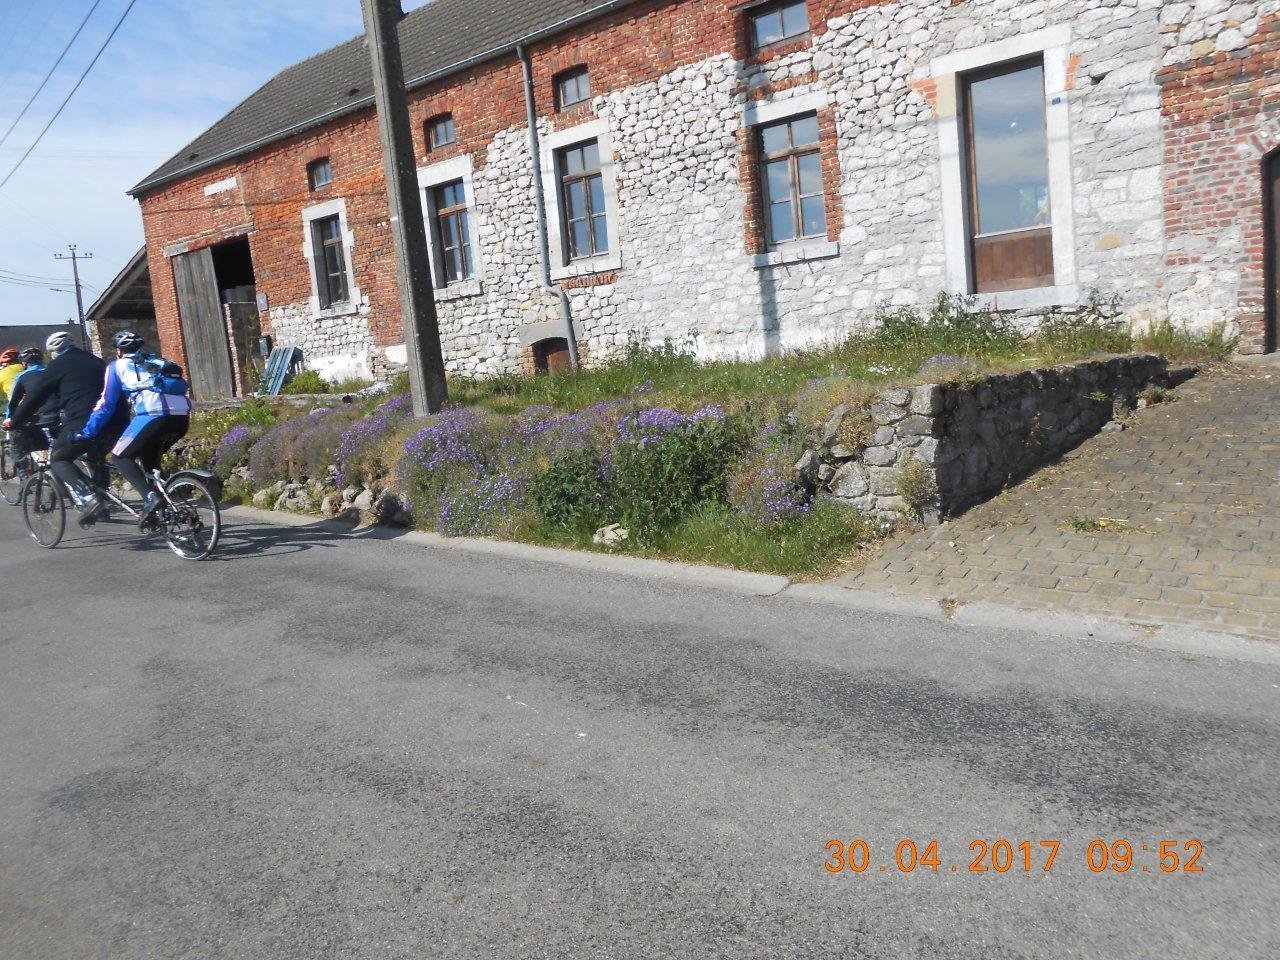 Cyclocoeur_2017 (34)